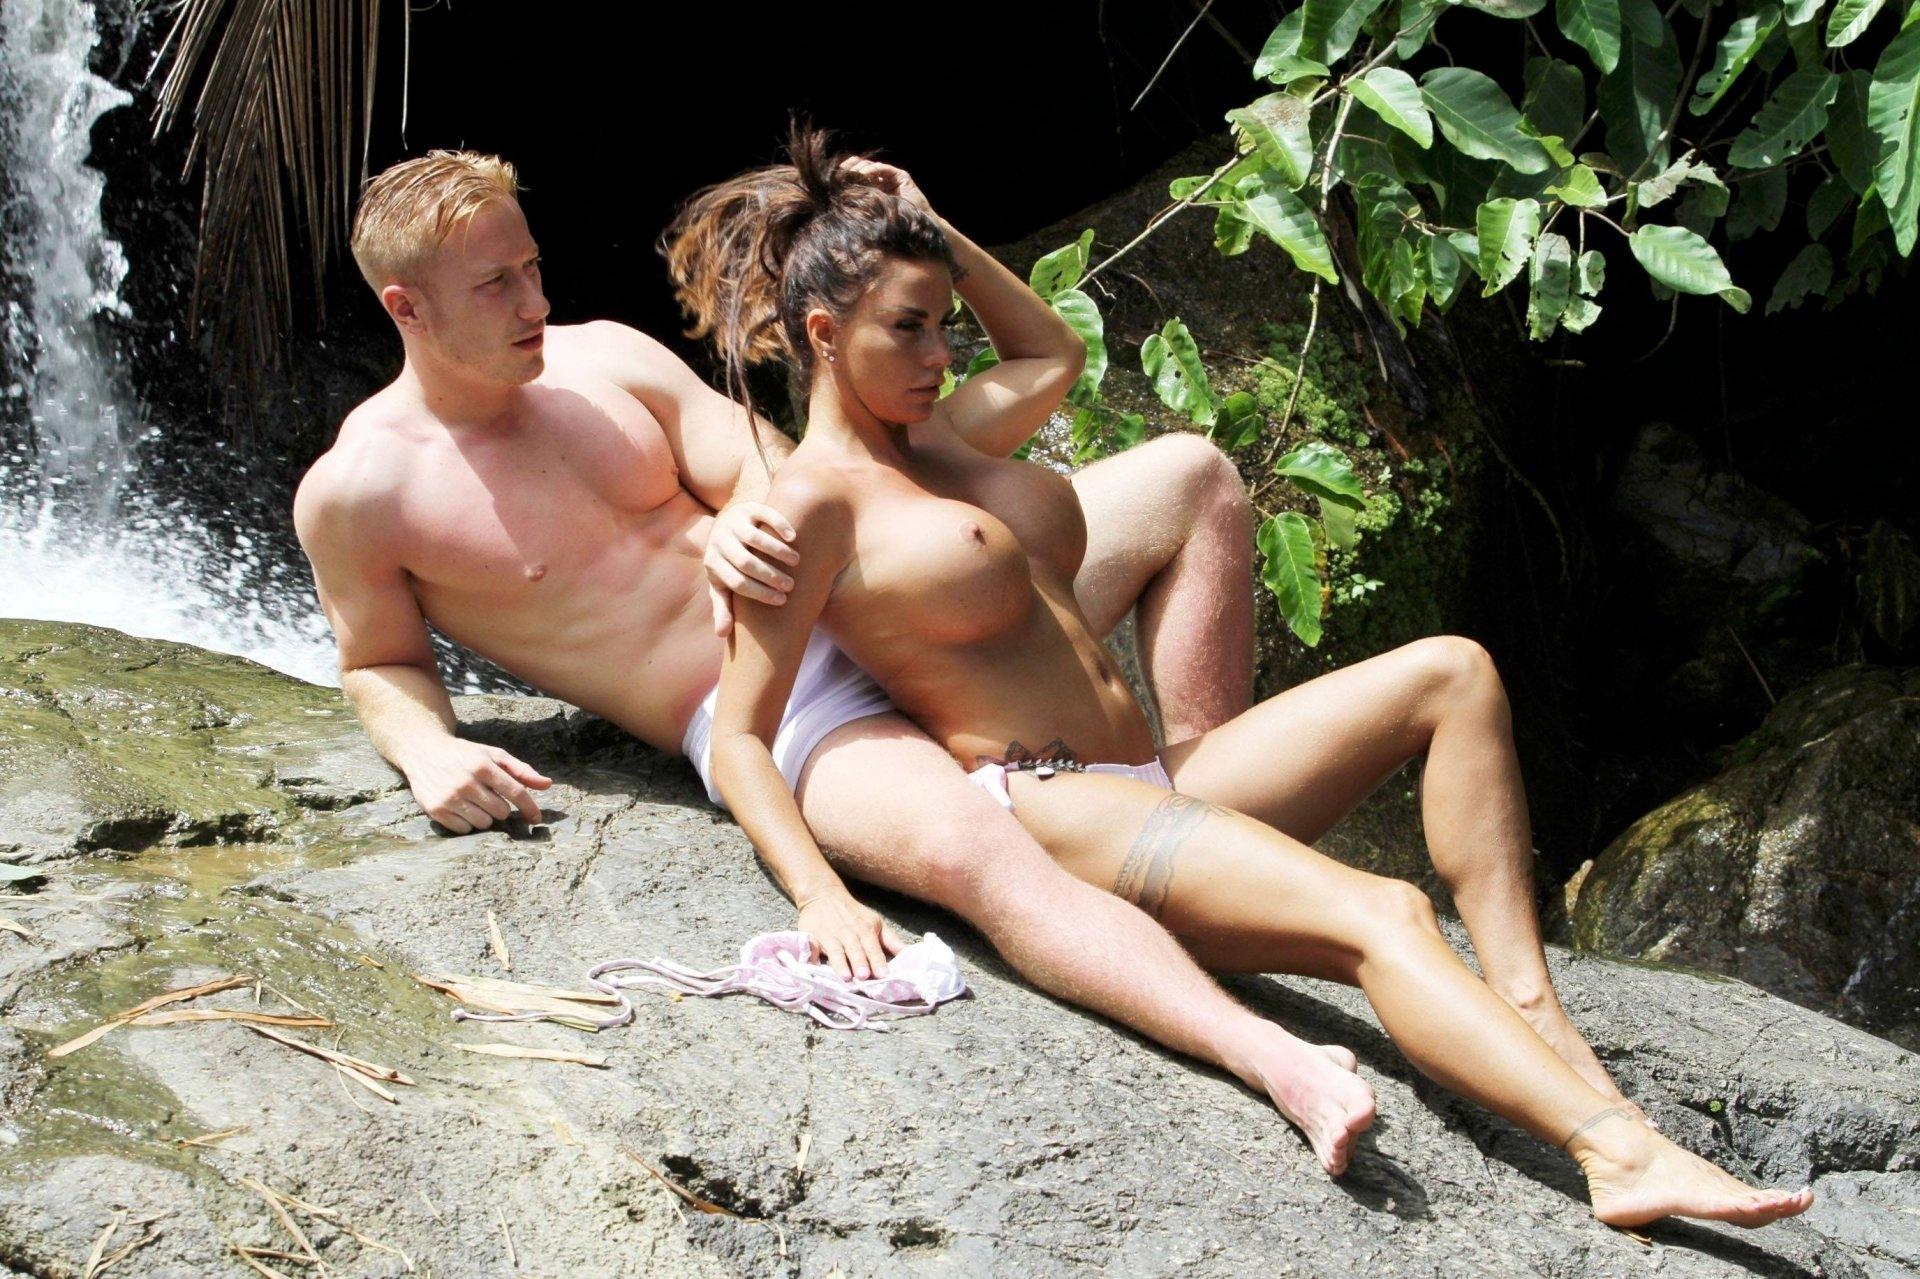 nudes (36 photos), Instagram Celebrity image